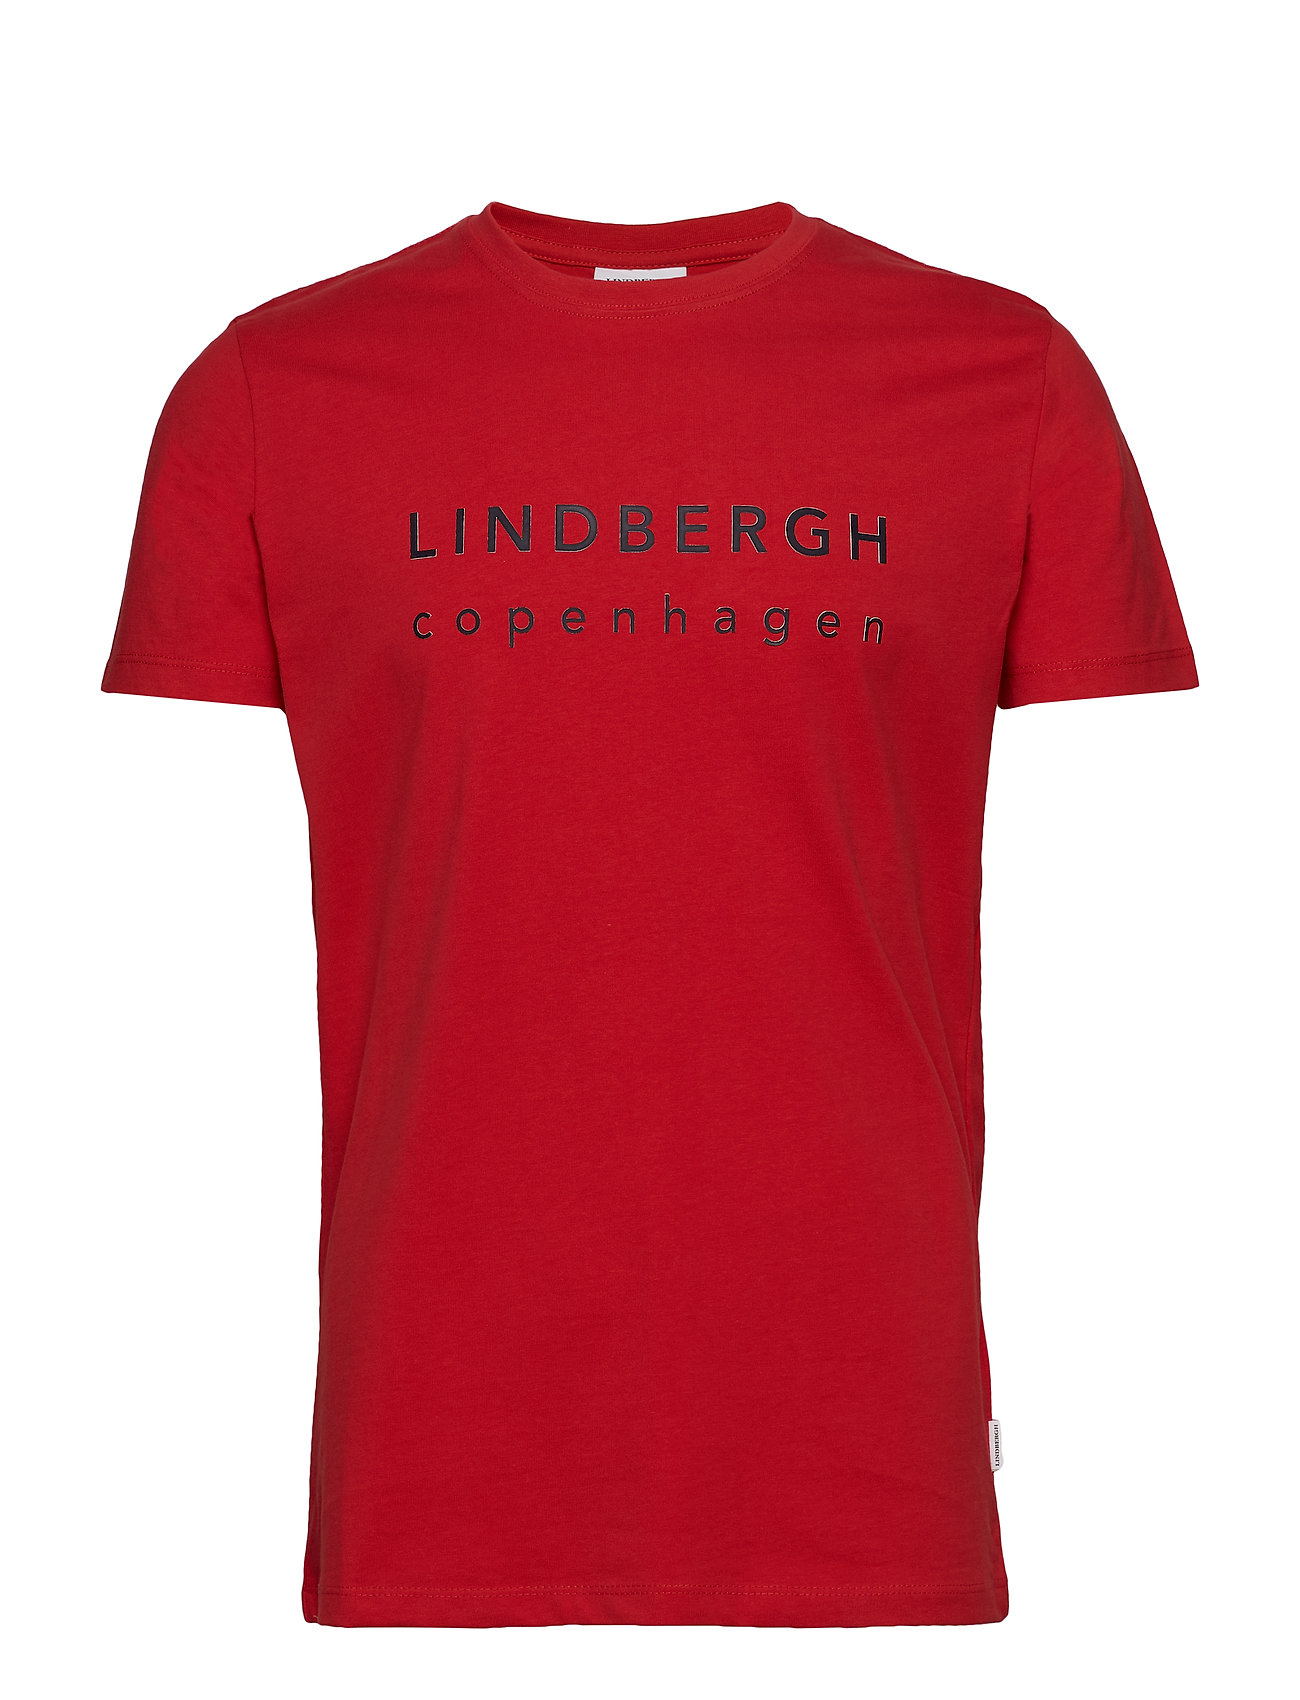 Lindbergh Logo print tee S S Ögrönlar